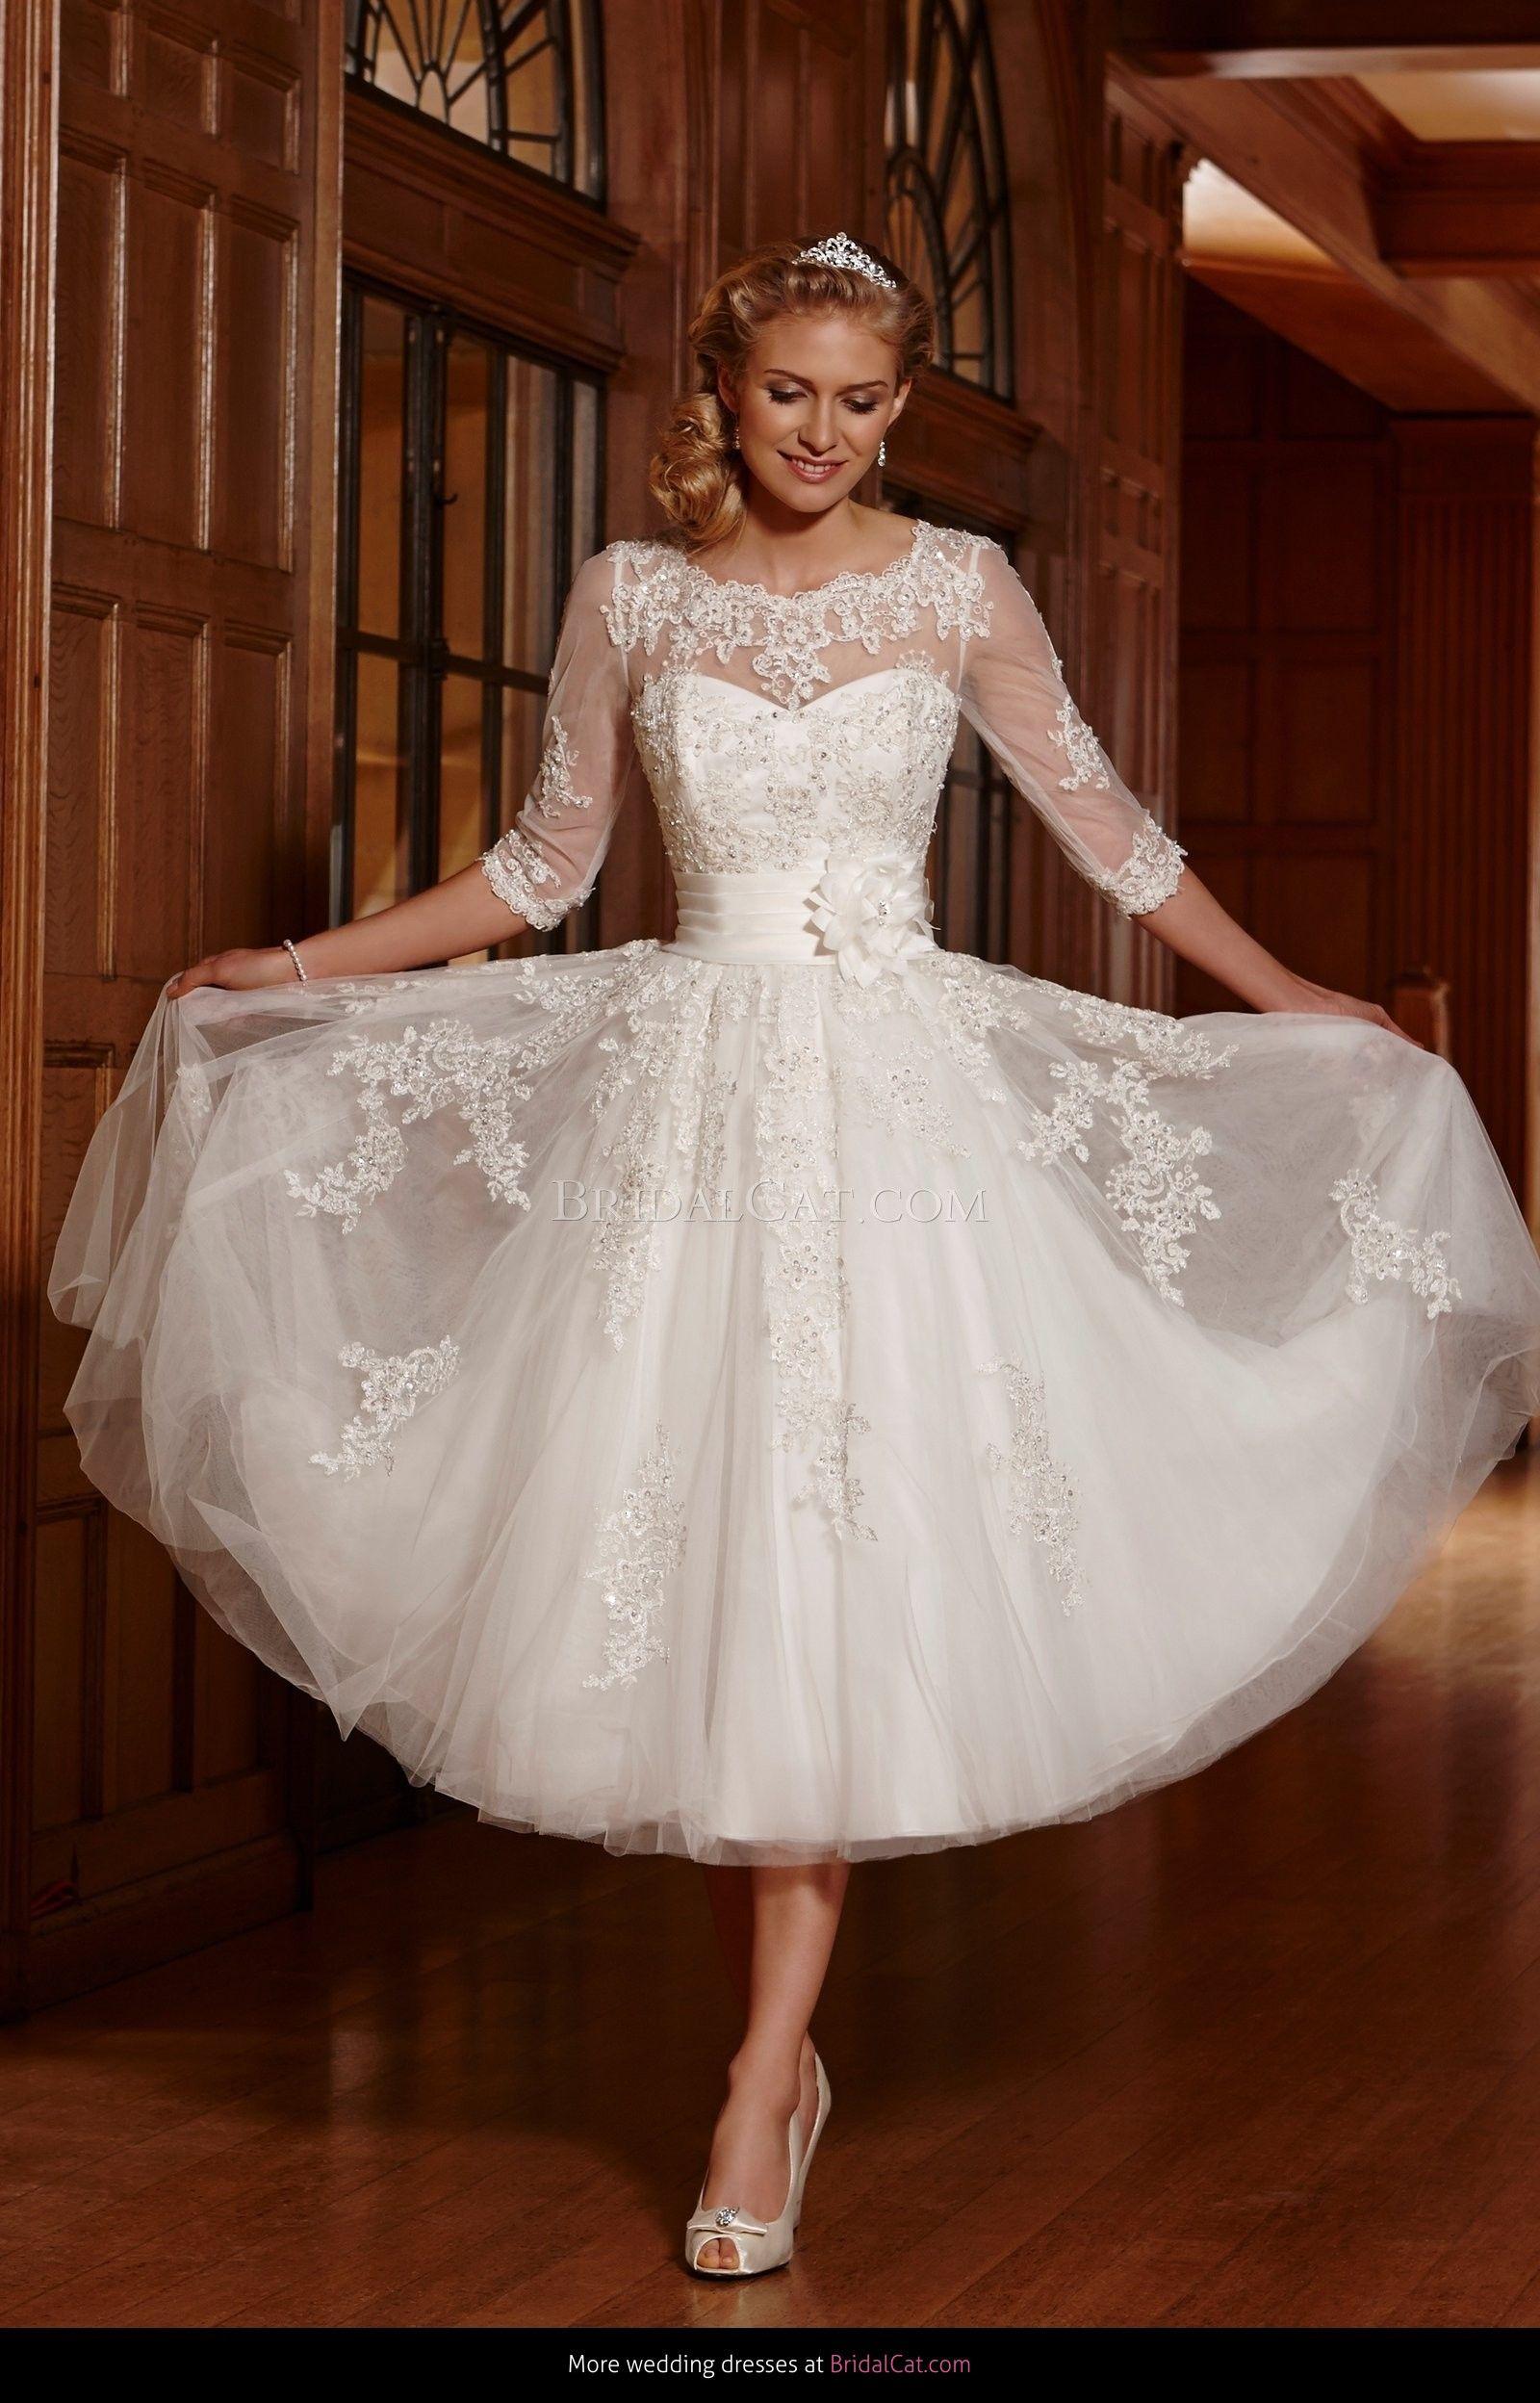 Under the knee wedding dresses wedding dress pinterest for Below the knee dresses for wedding